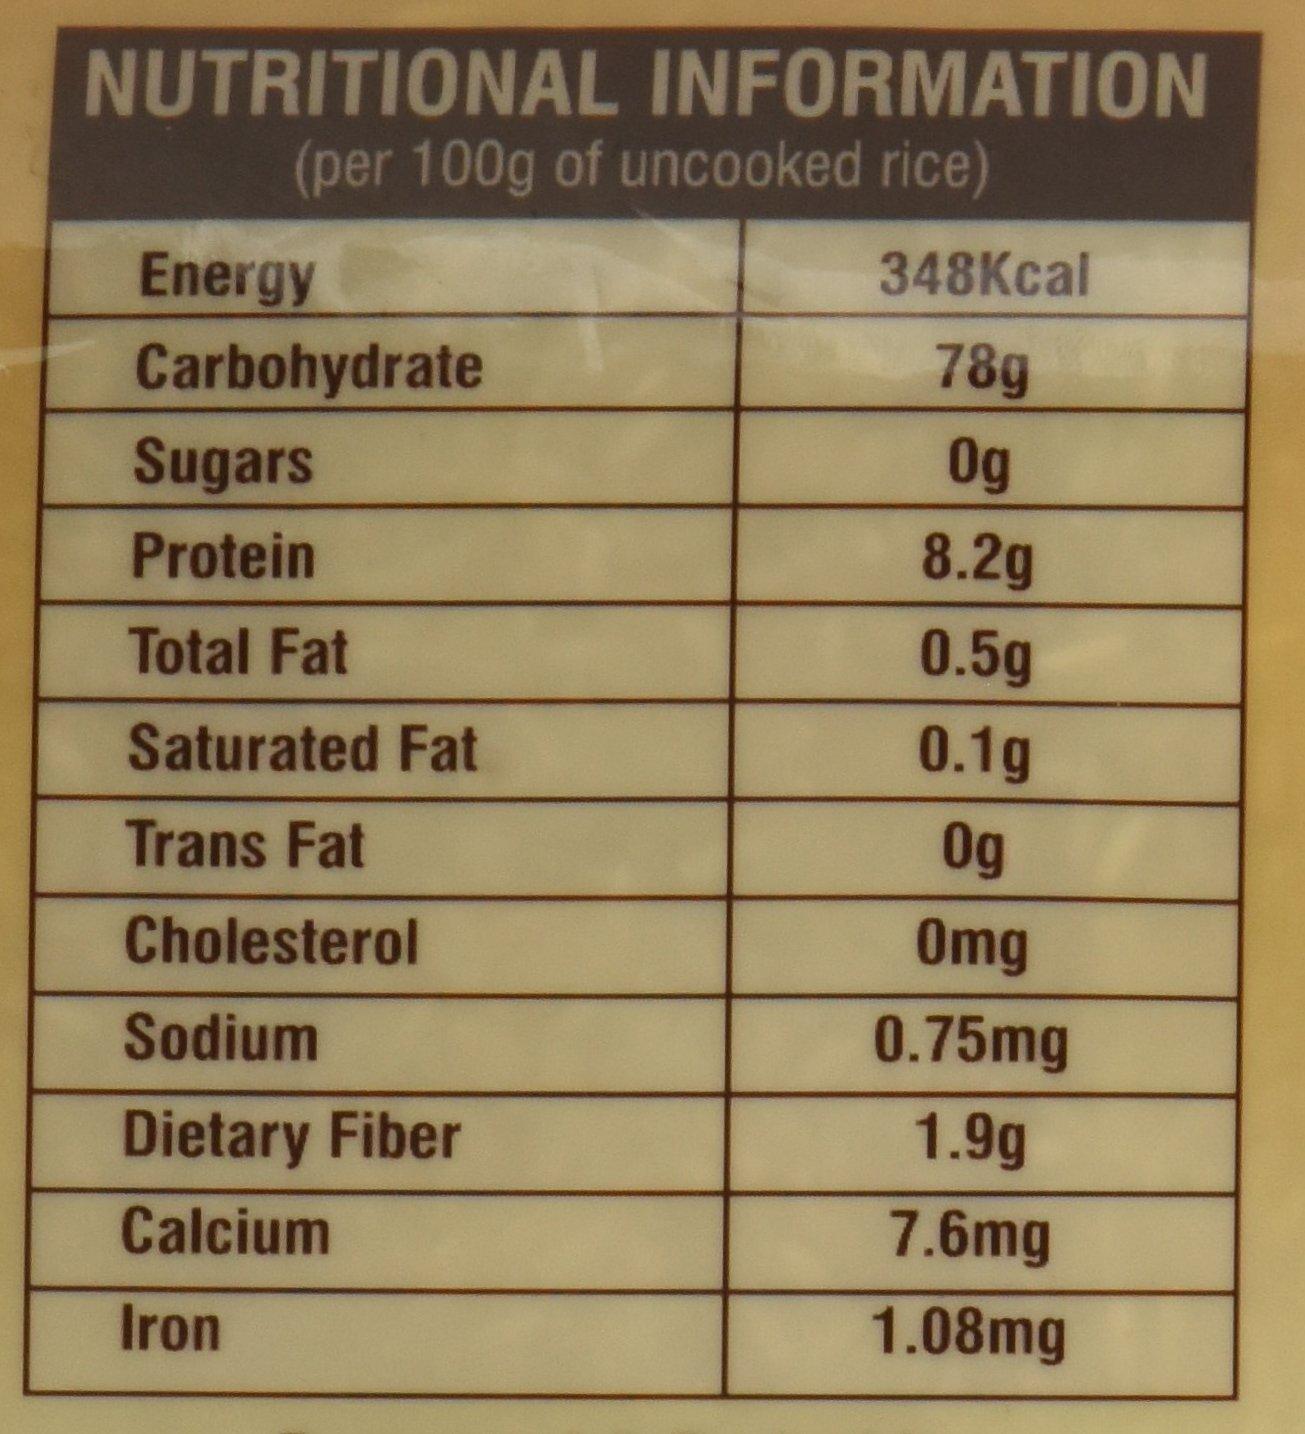 Daawat Rozana Super Basmati Rice 5kg Amazon Grocery Gourmet